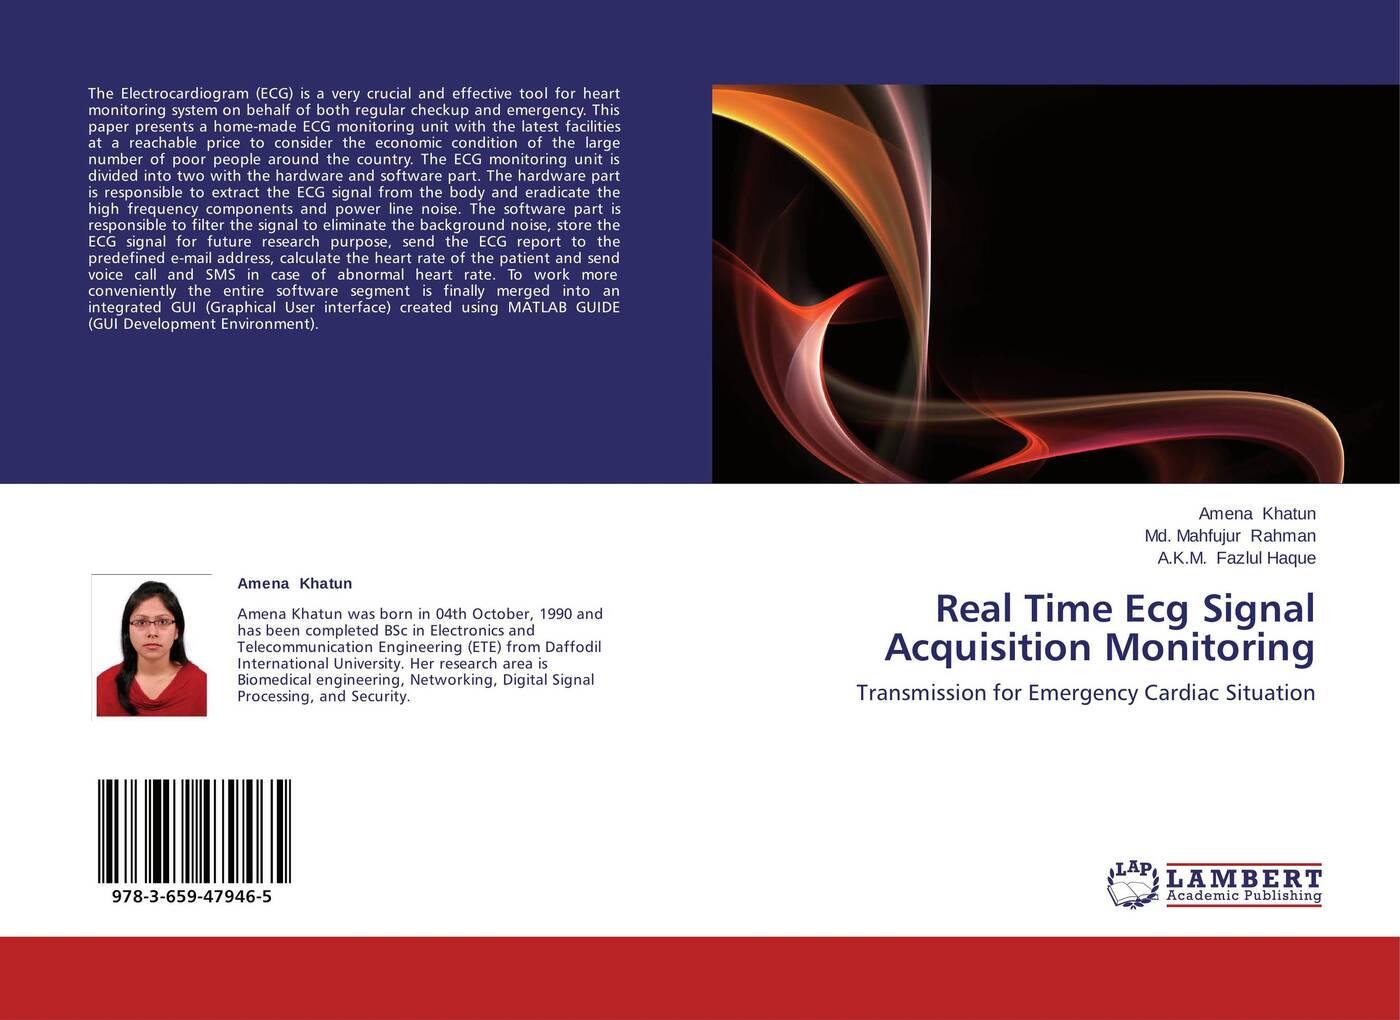 Amena Khatun,Md. Mahfujur Rahman and A.K.M. Fazlul Haque Real Time Ecg Signal Acquisition Monitoring нордавинд ecg dongle кардиофлешка